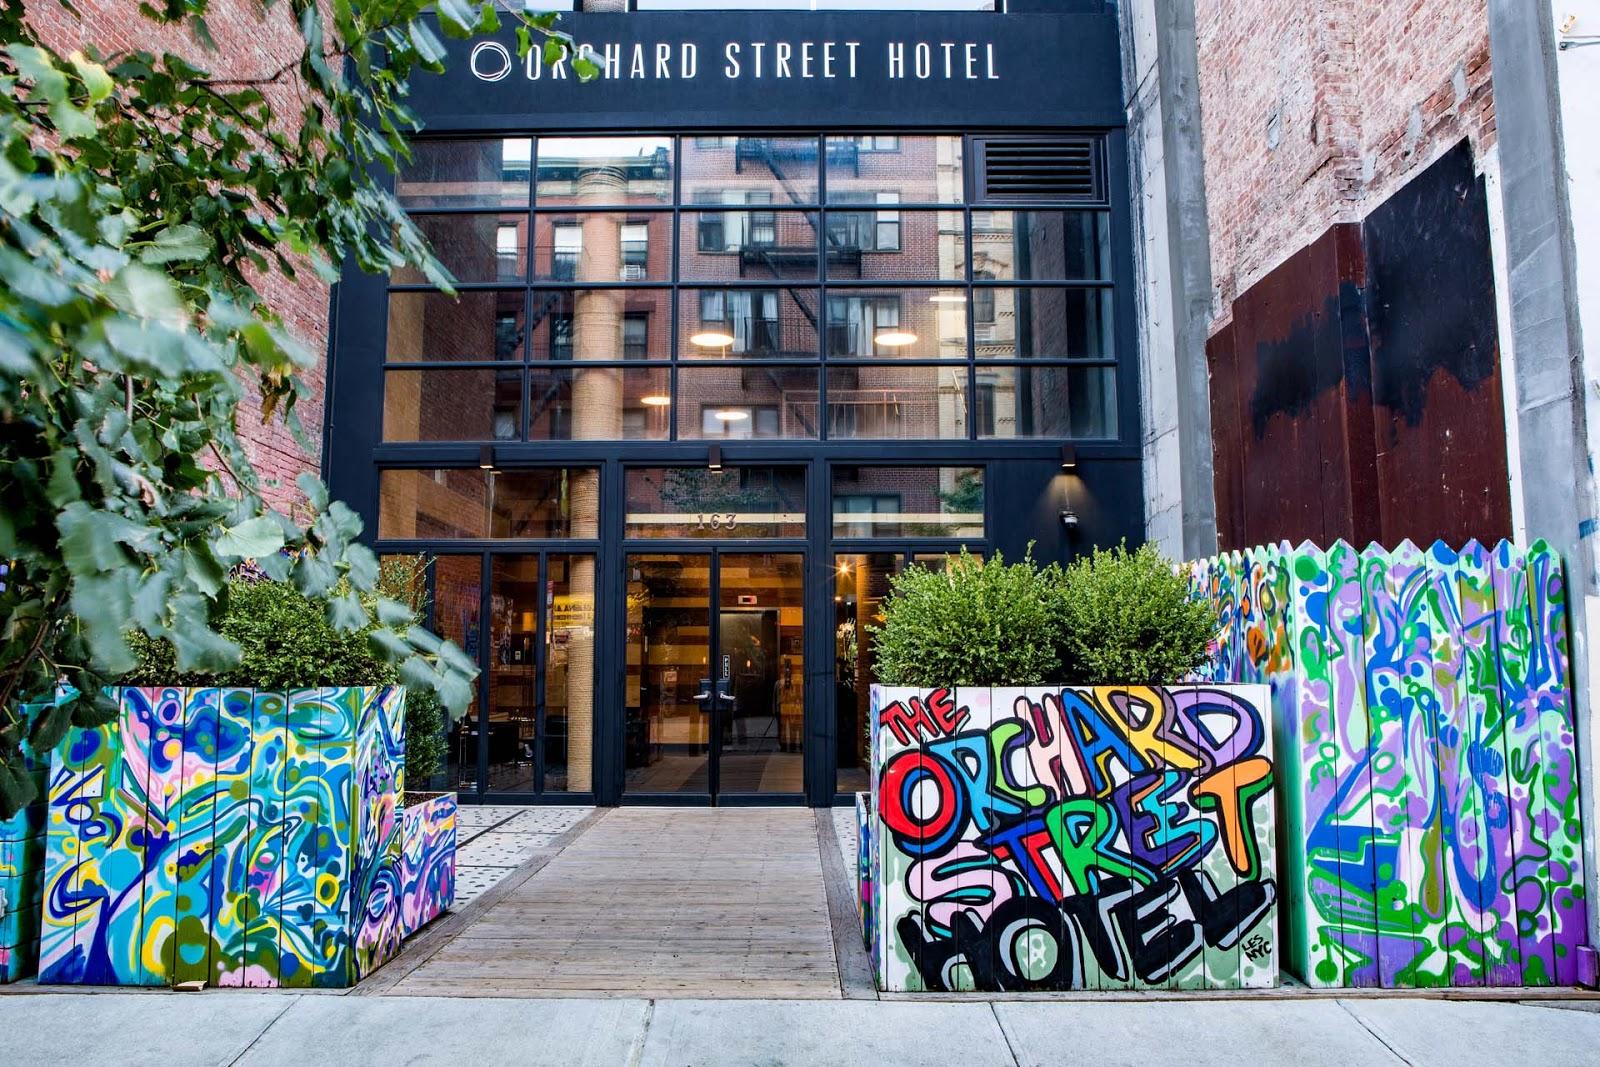 Orchard Street Hotel